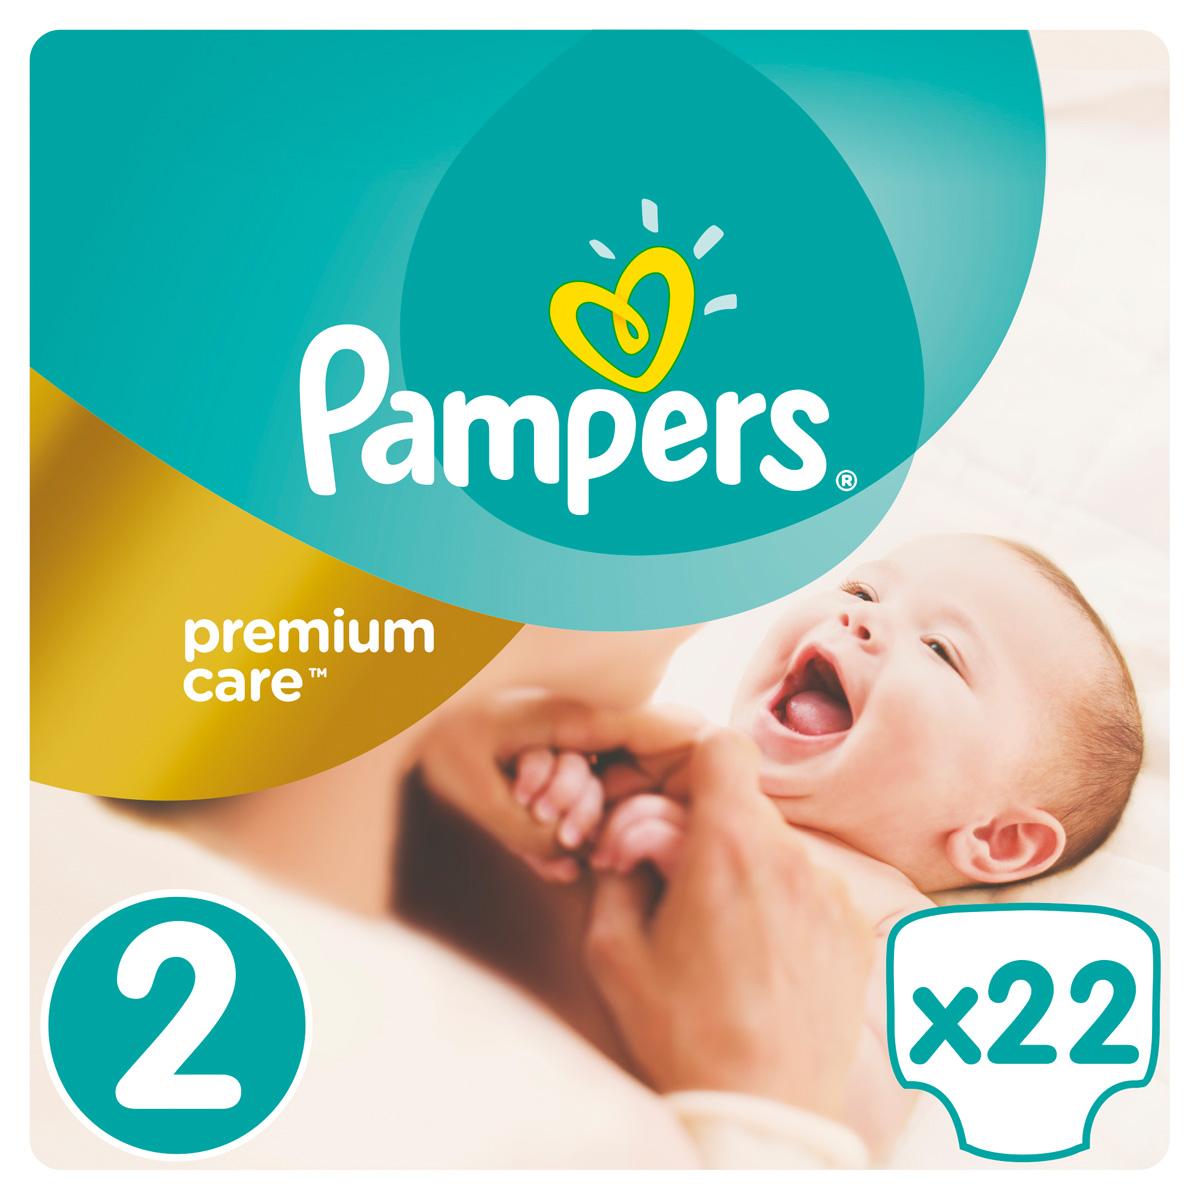 Pampers Подгузники Premium Care 3-6 кг (размер 2) 22 шт подгузники детские pampers подгузники pampers premium care 2 5 кг 1 размер 88 шт